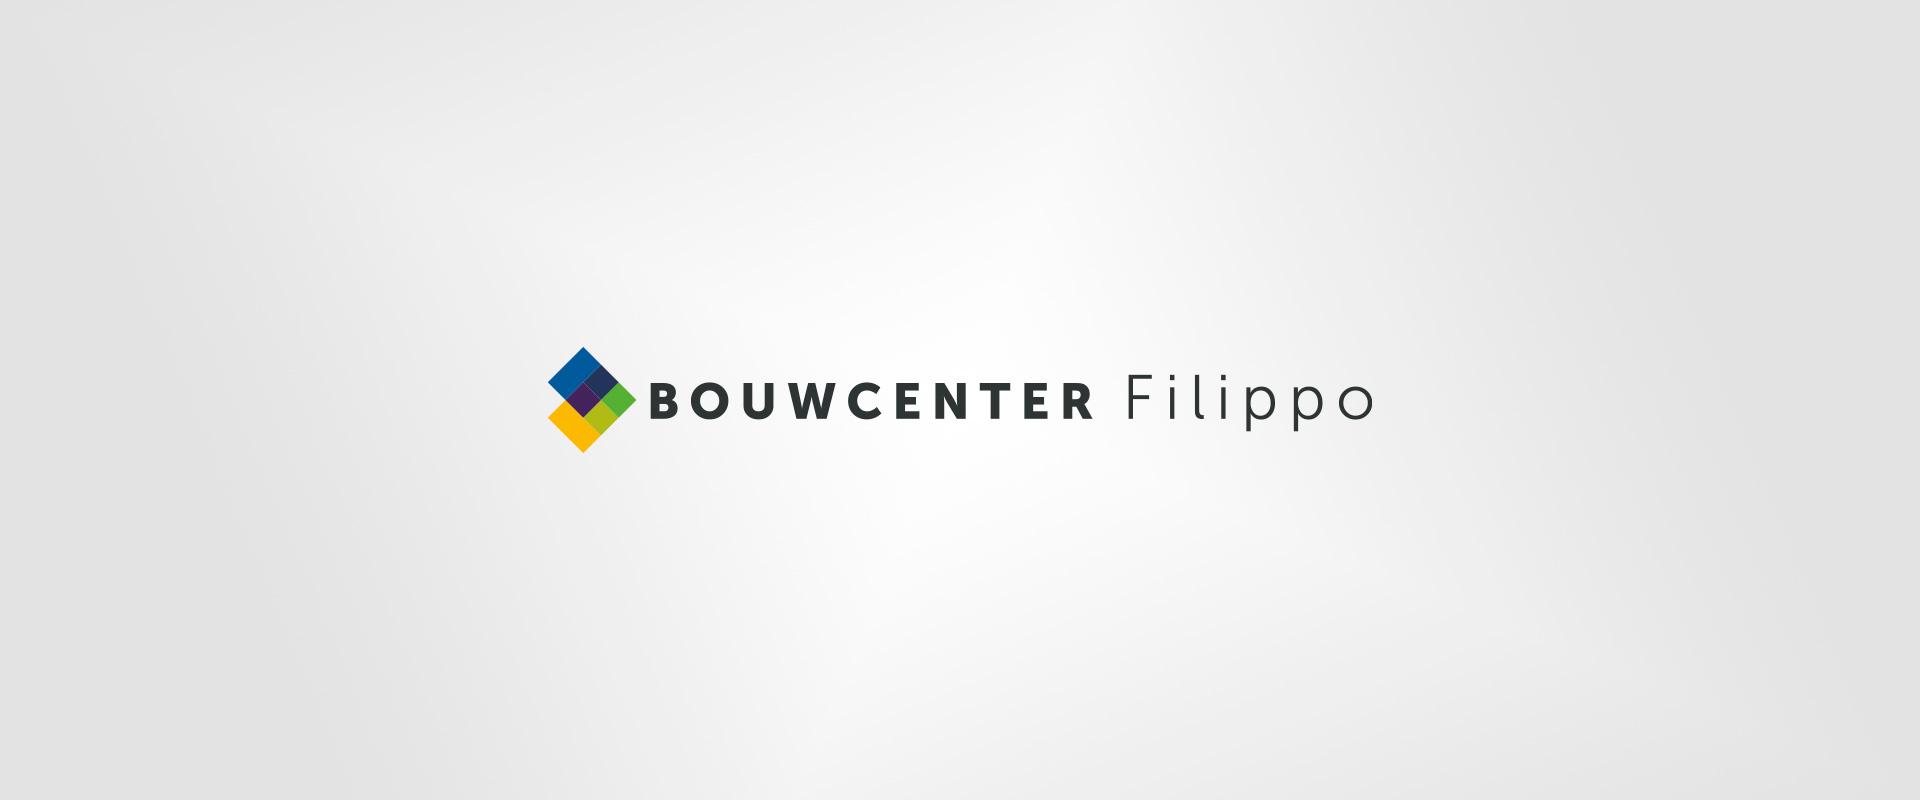 Bouwcenter Filippo Bouwcenter